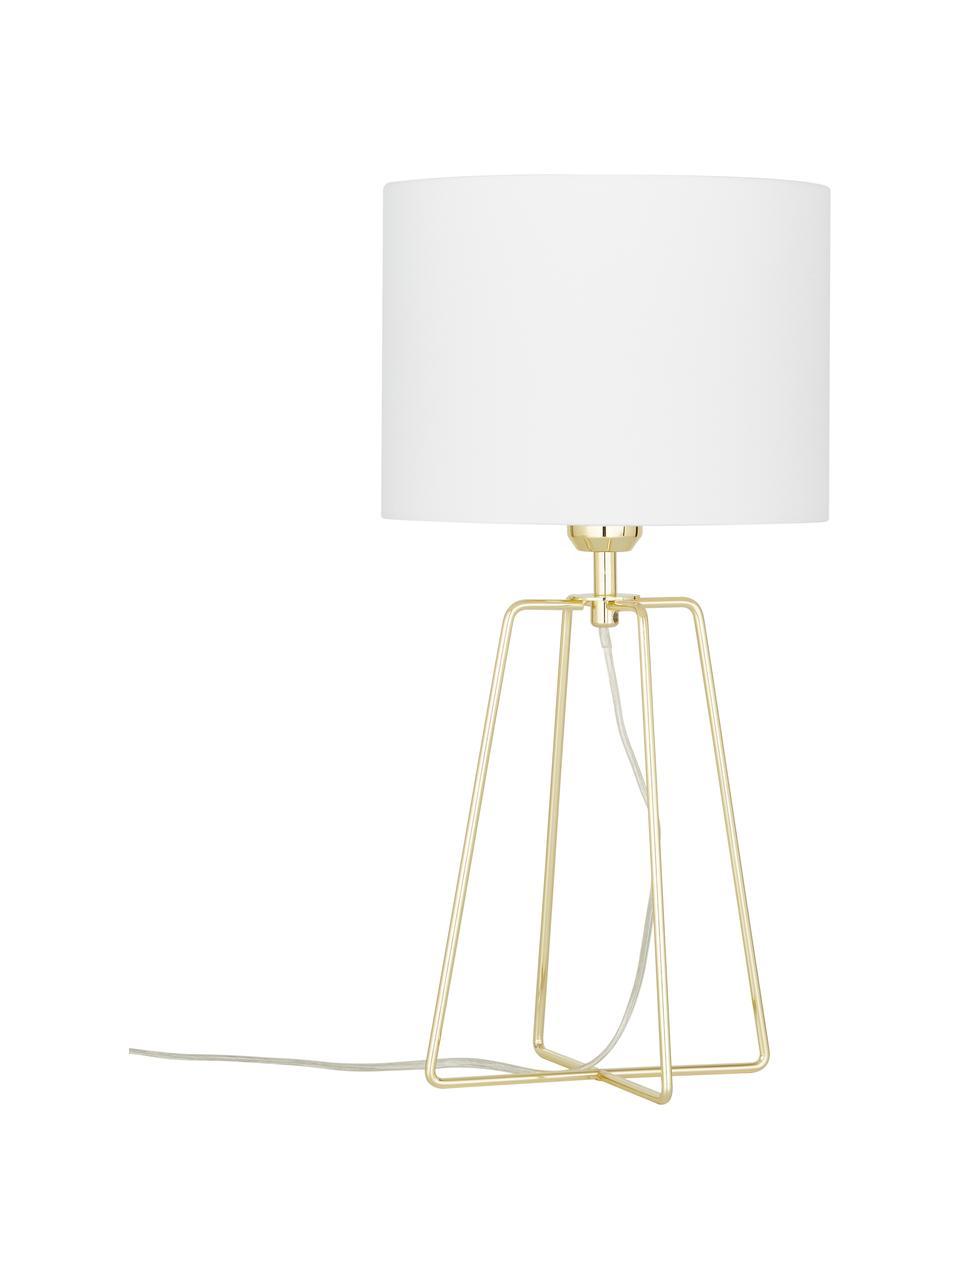 Tafellamp Karolina in wit-goudkleur, Lampenkap: katoen, Lampvoet: vermessingd metaal, Wit, goudkleurig, Ø 25 x H 49 cm